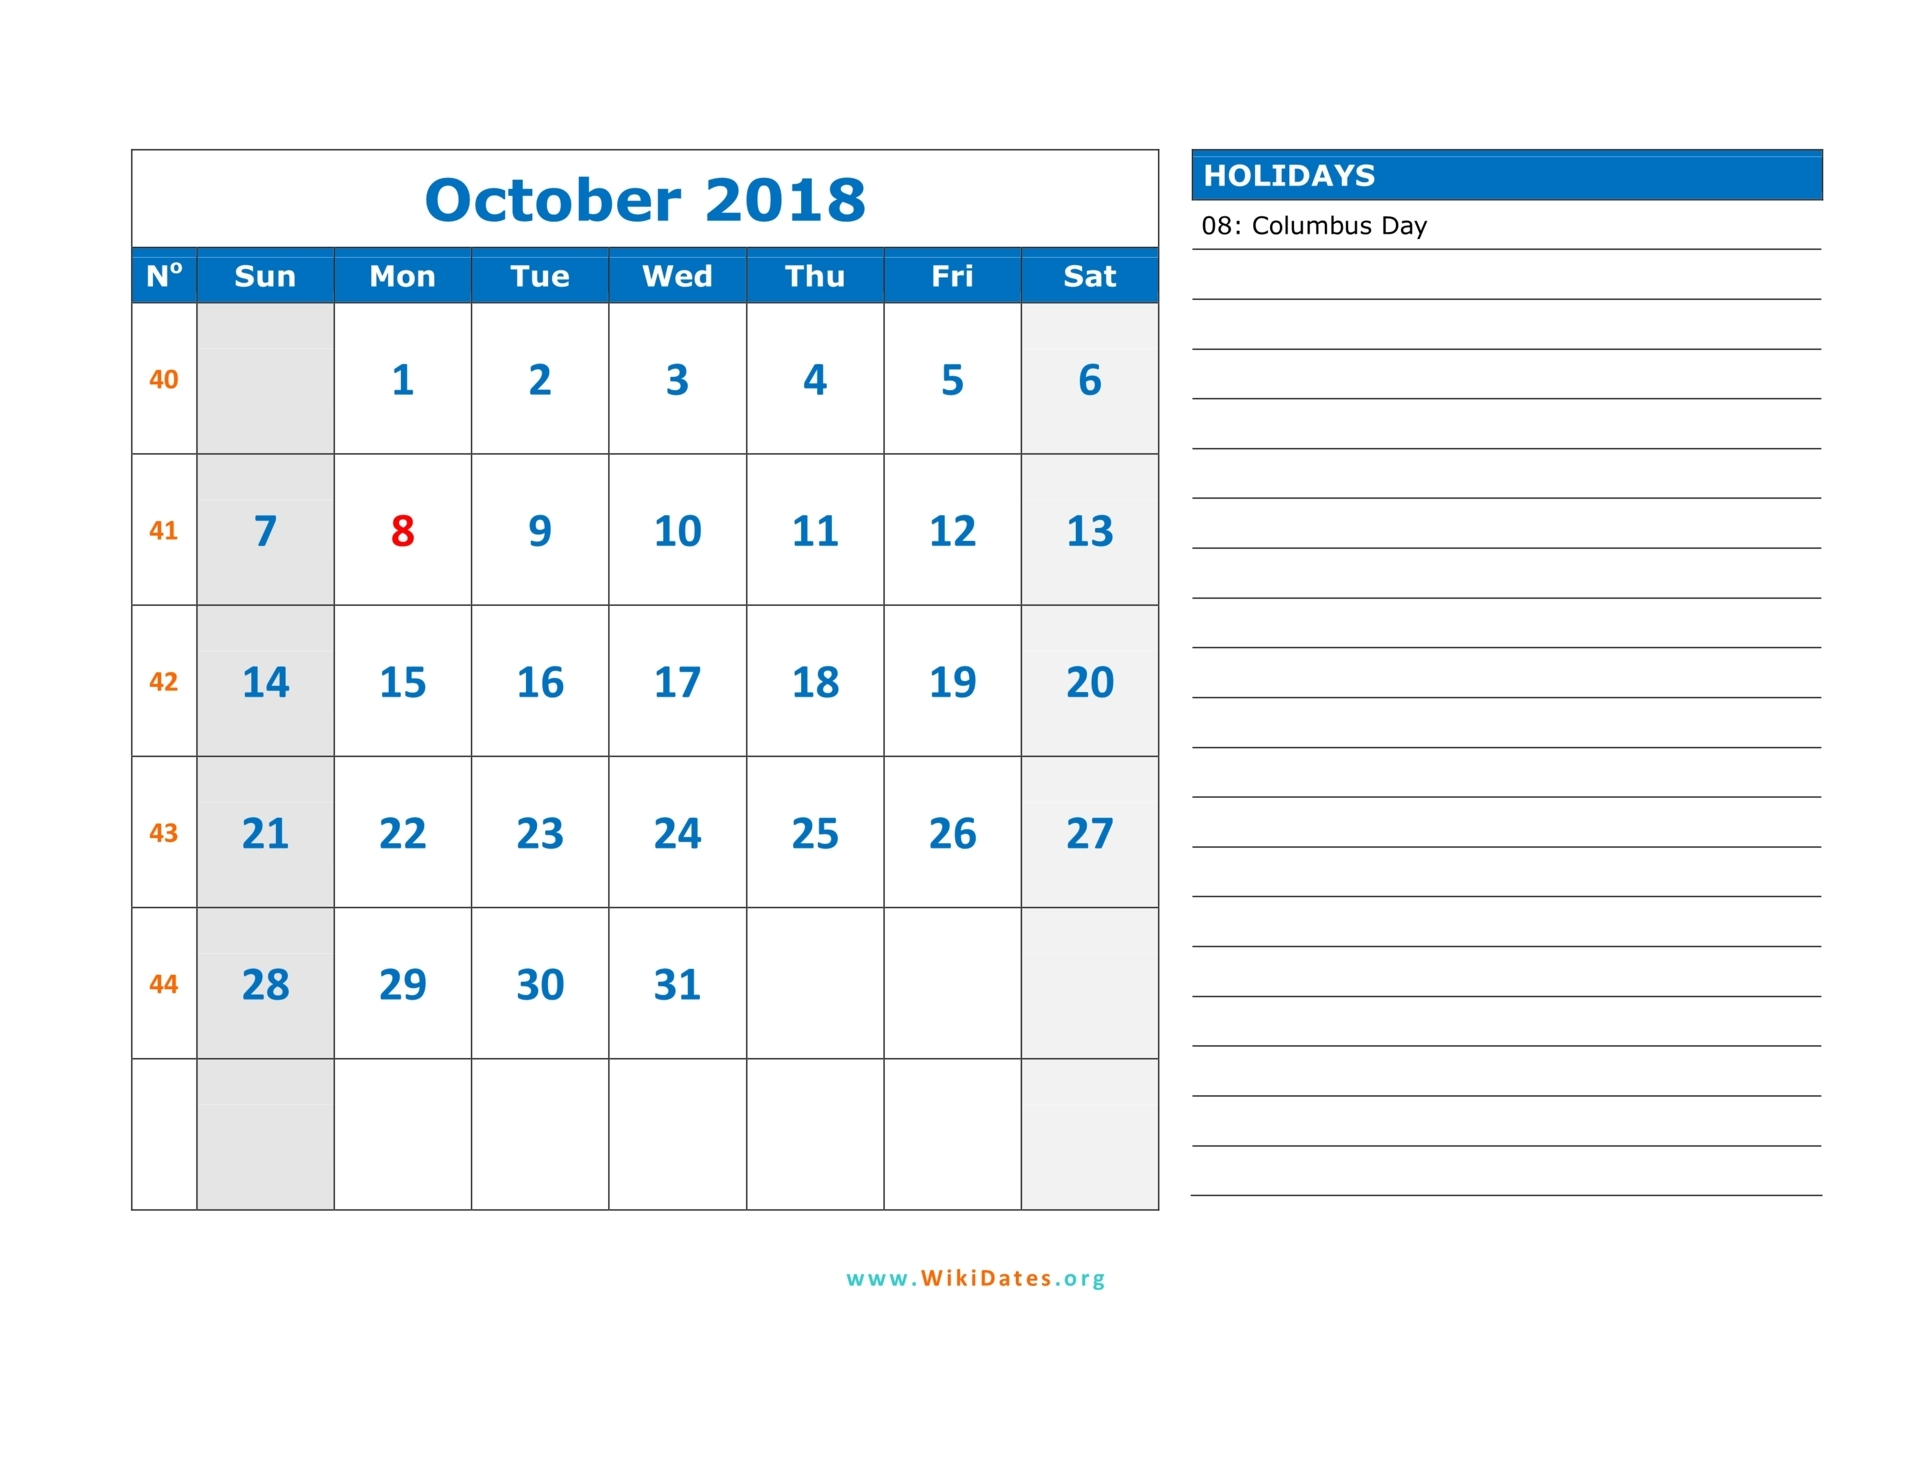 October 2018 Calendar | WikiDates.org